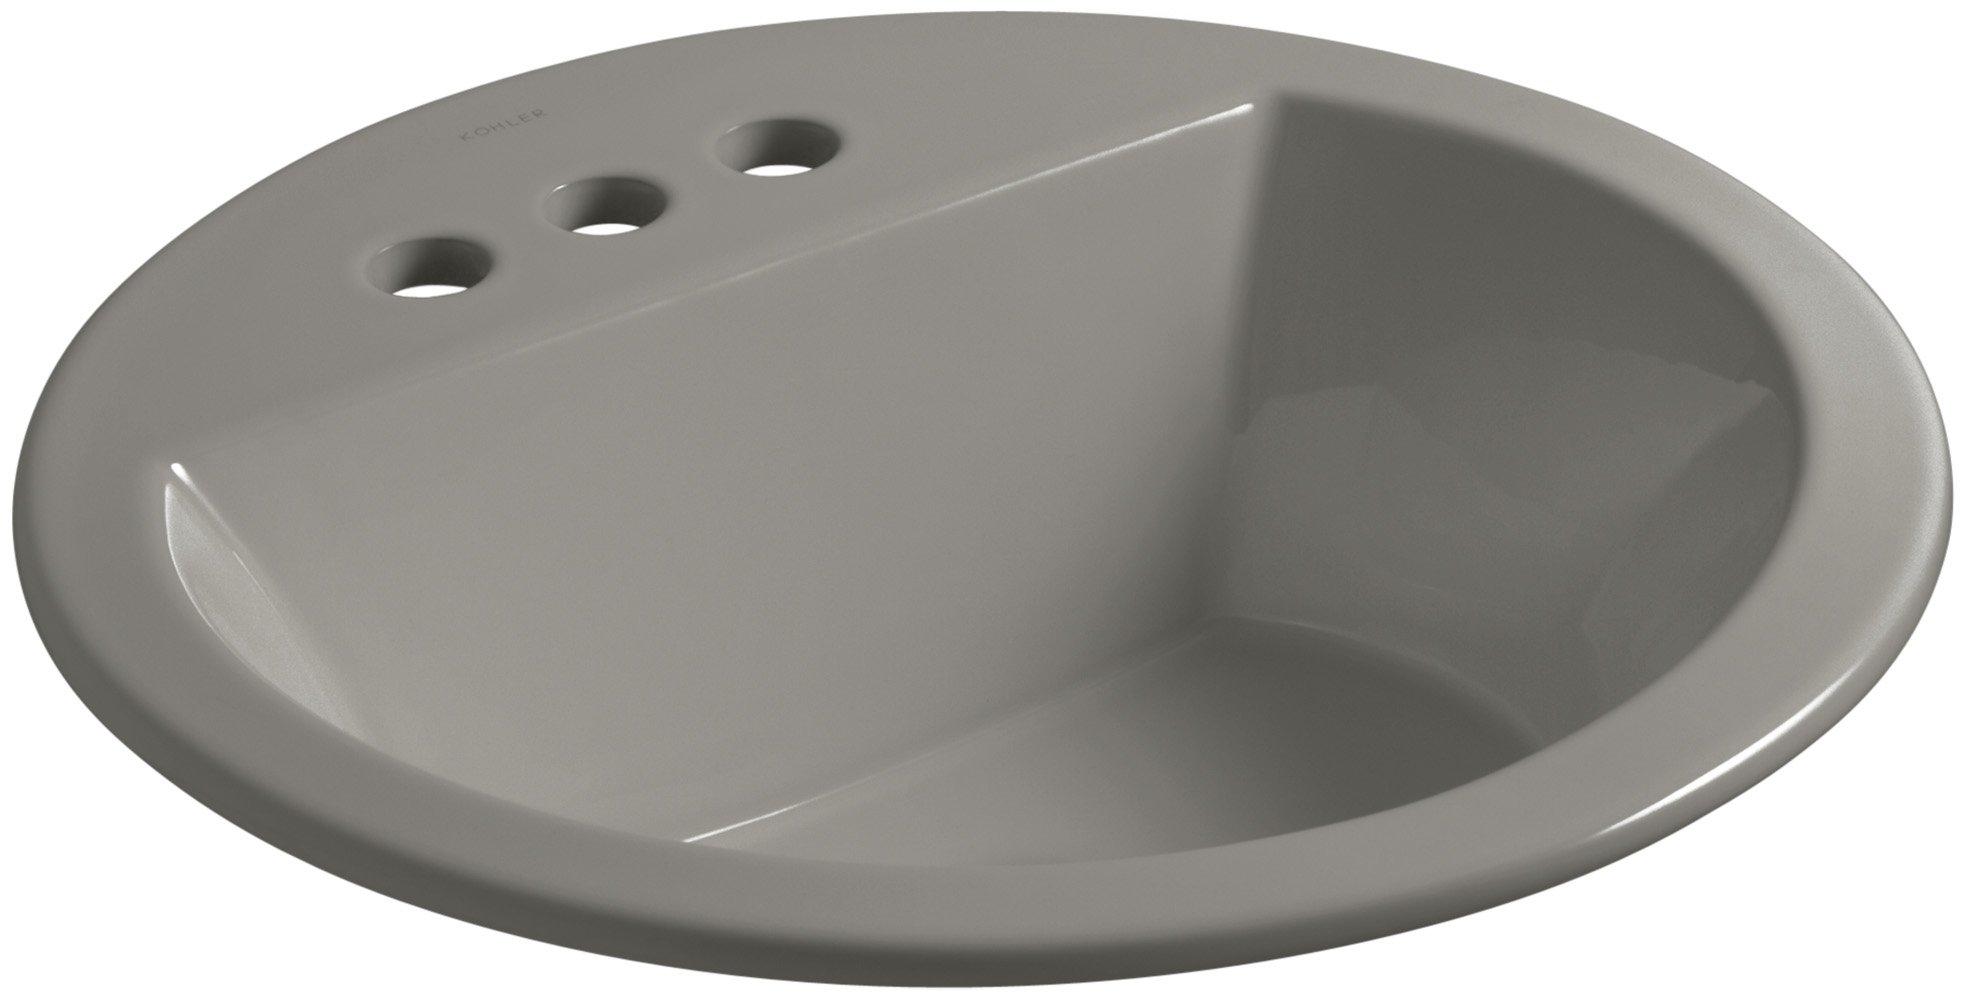 KOHLER K-2714-4-K4 Bryant Round Drop-In Bathroom Sink with Centerset Faucet Holes, 4'', Cashmere by Kohler